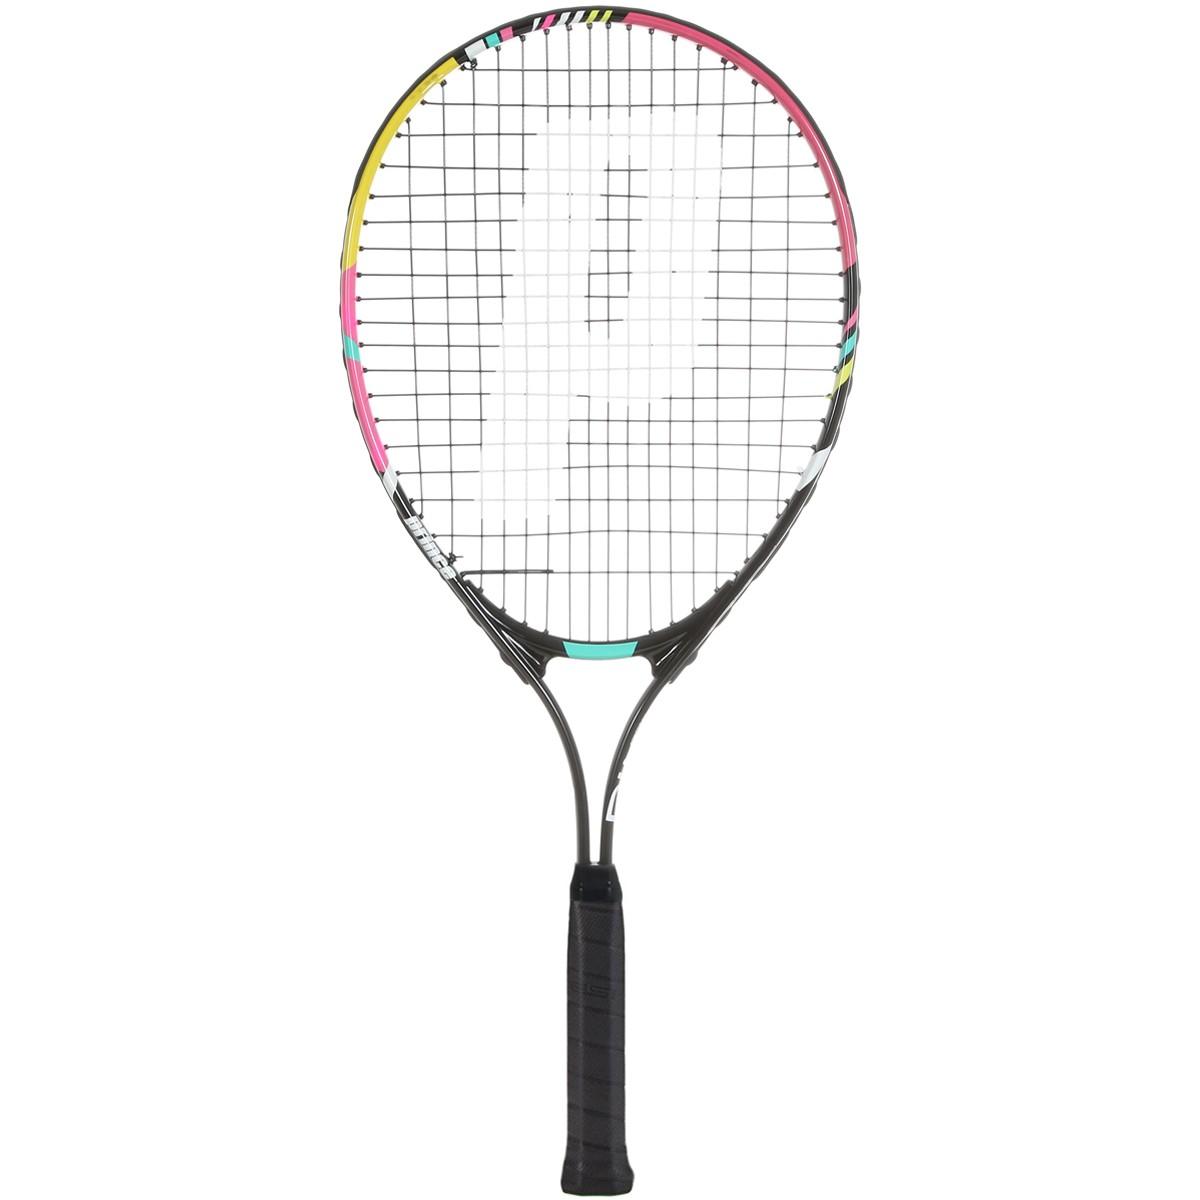 Raquete de Tênis PRINCE PINK 21